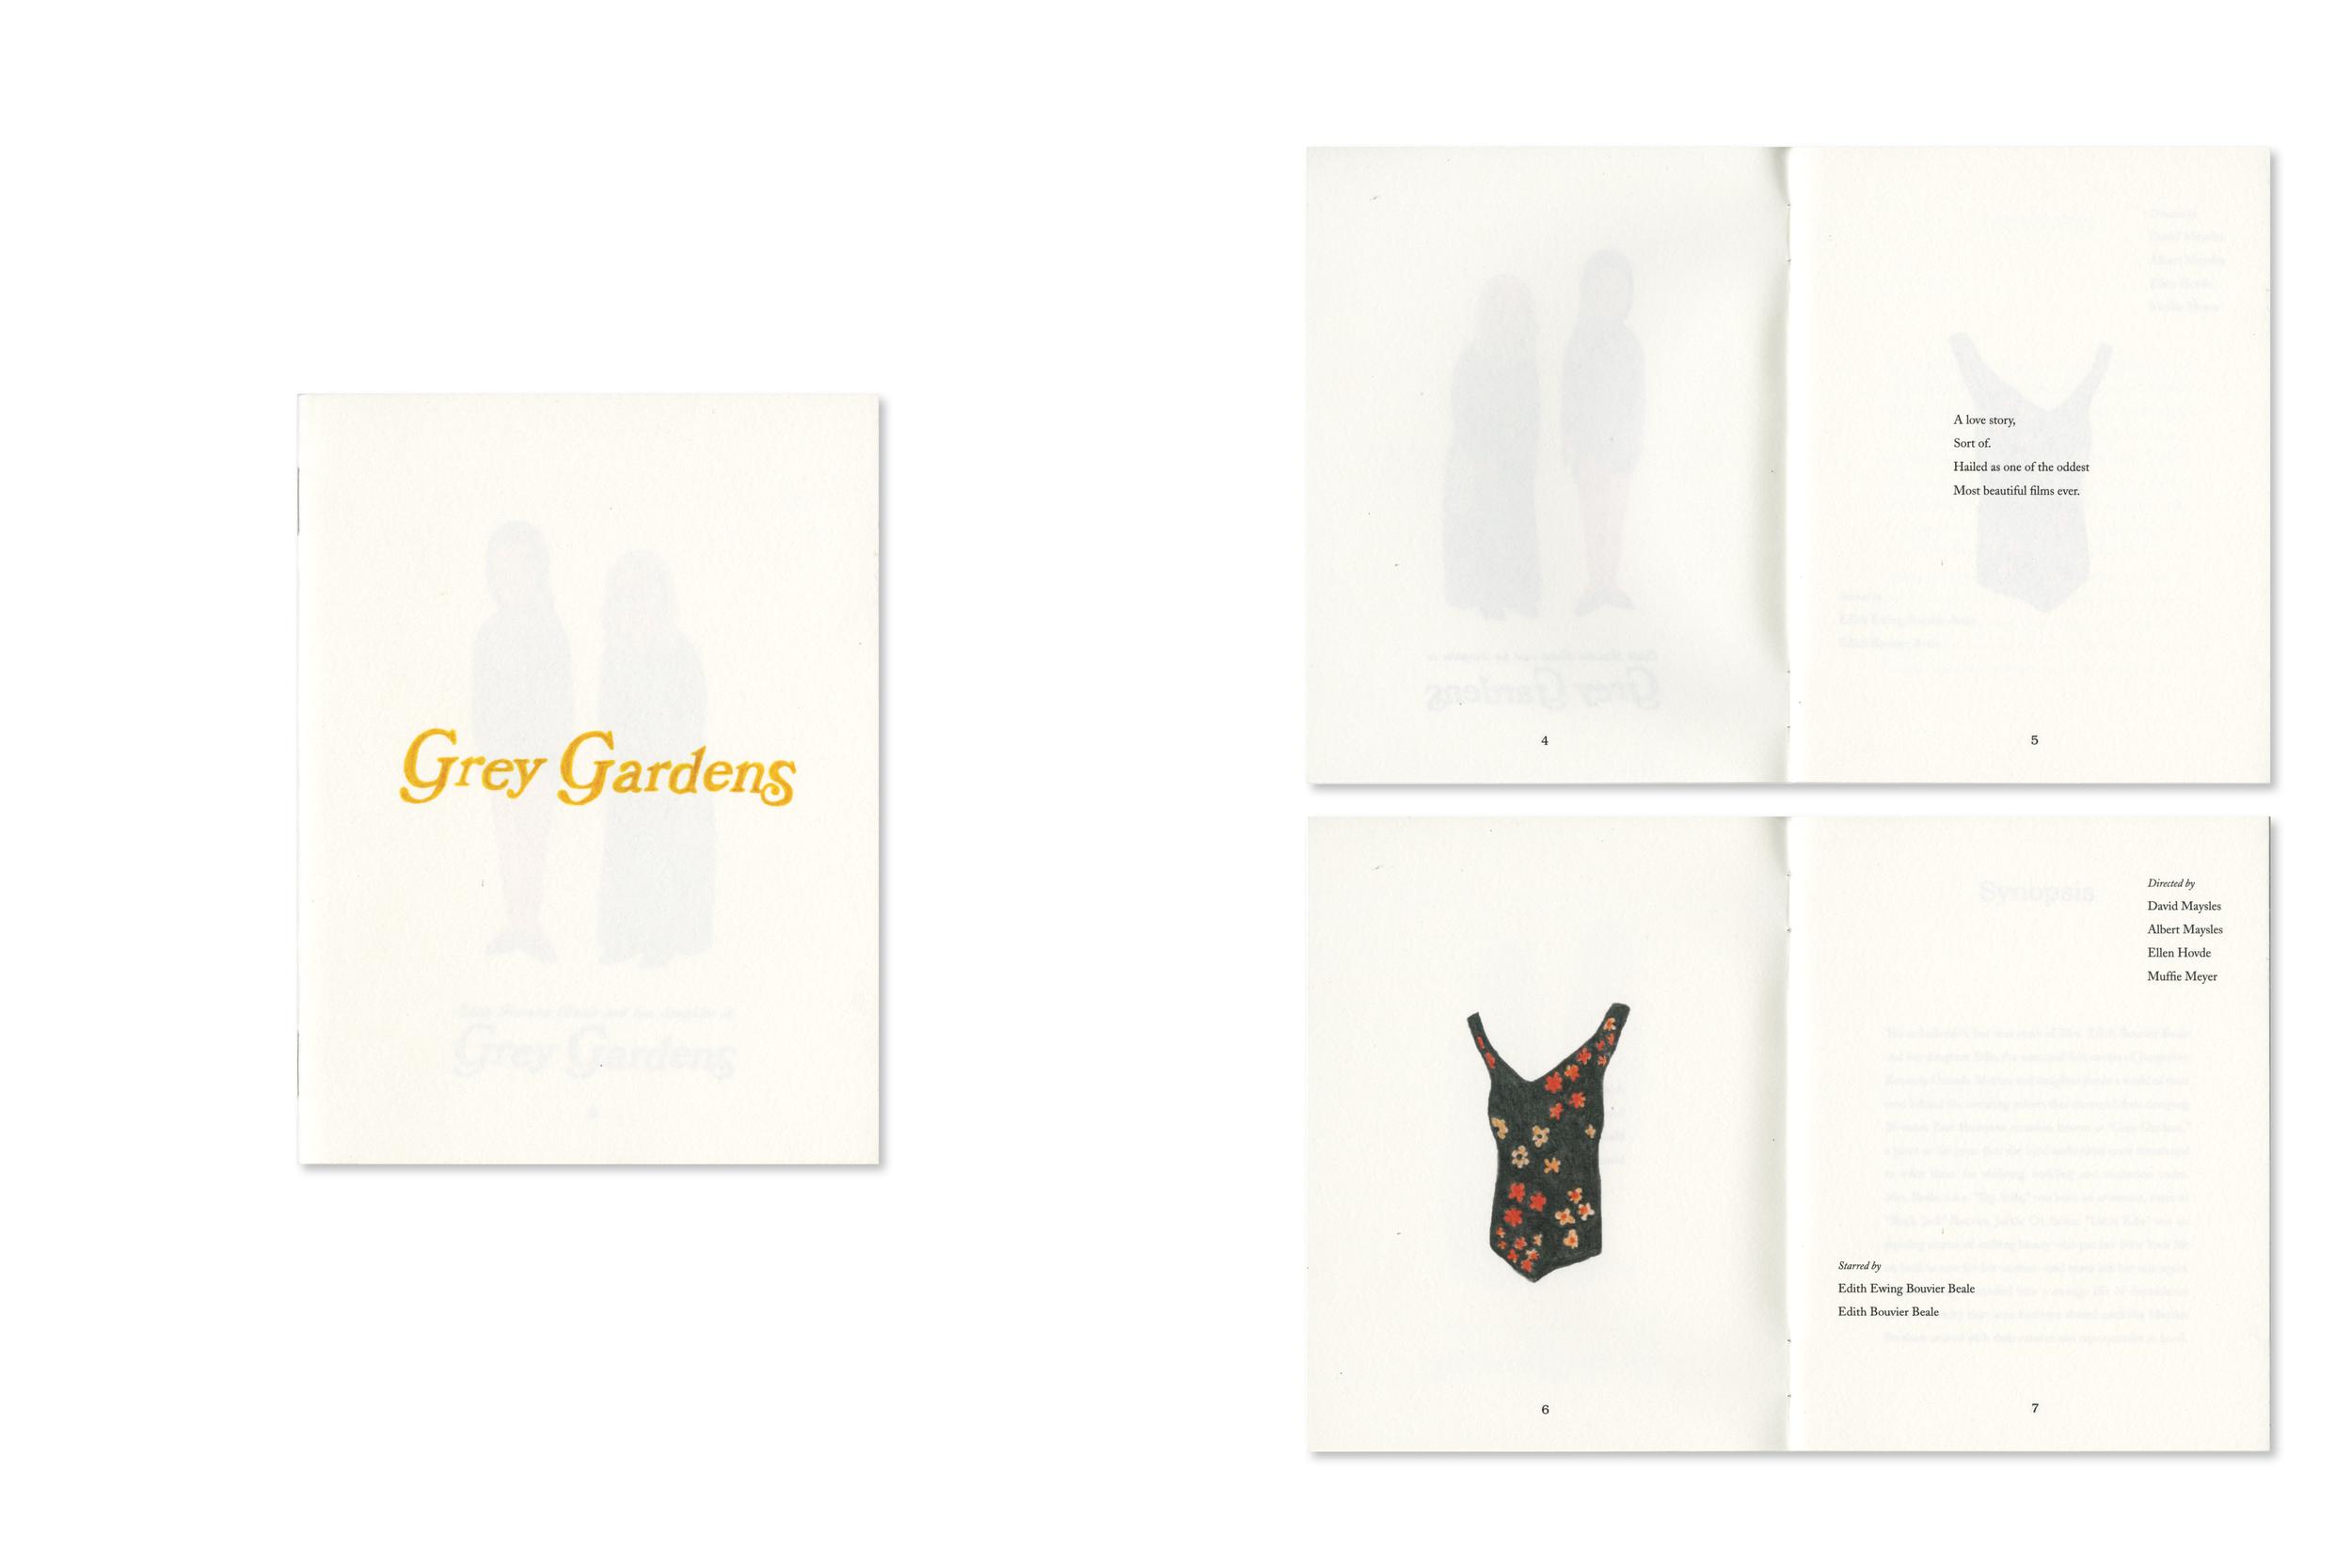 greygarden portfolio.png